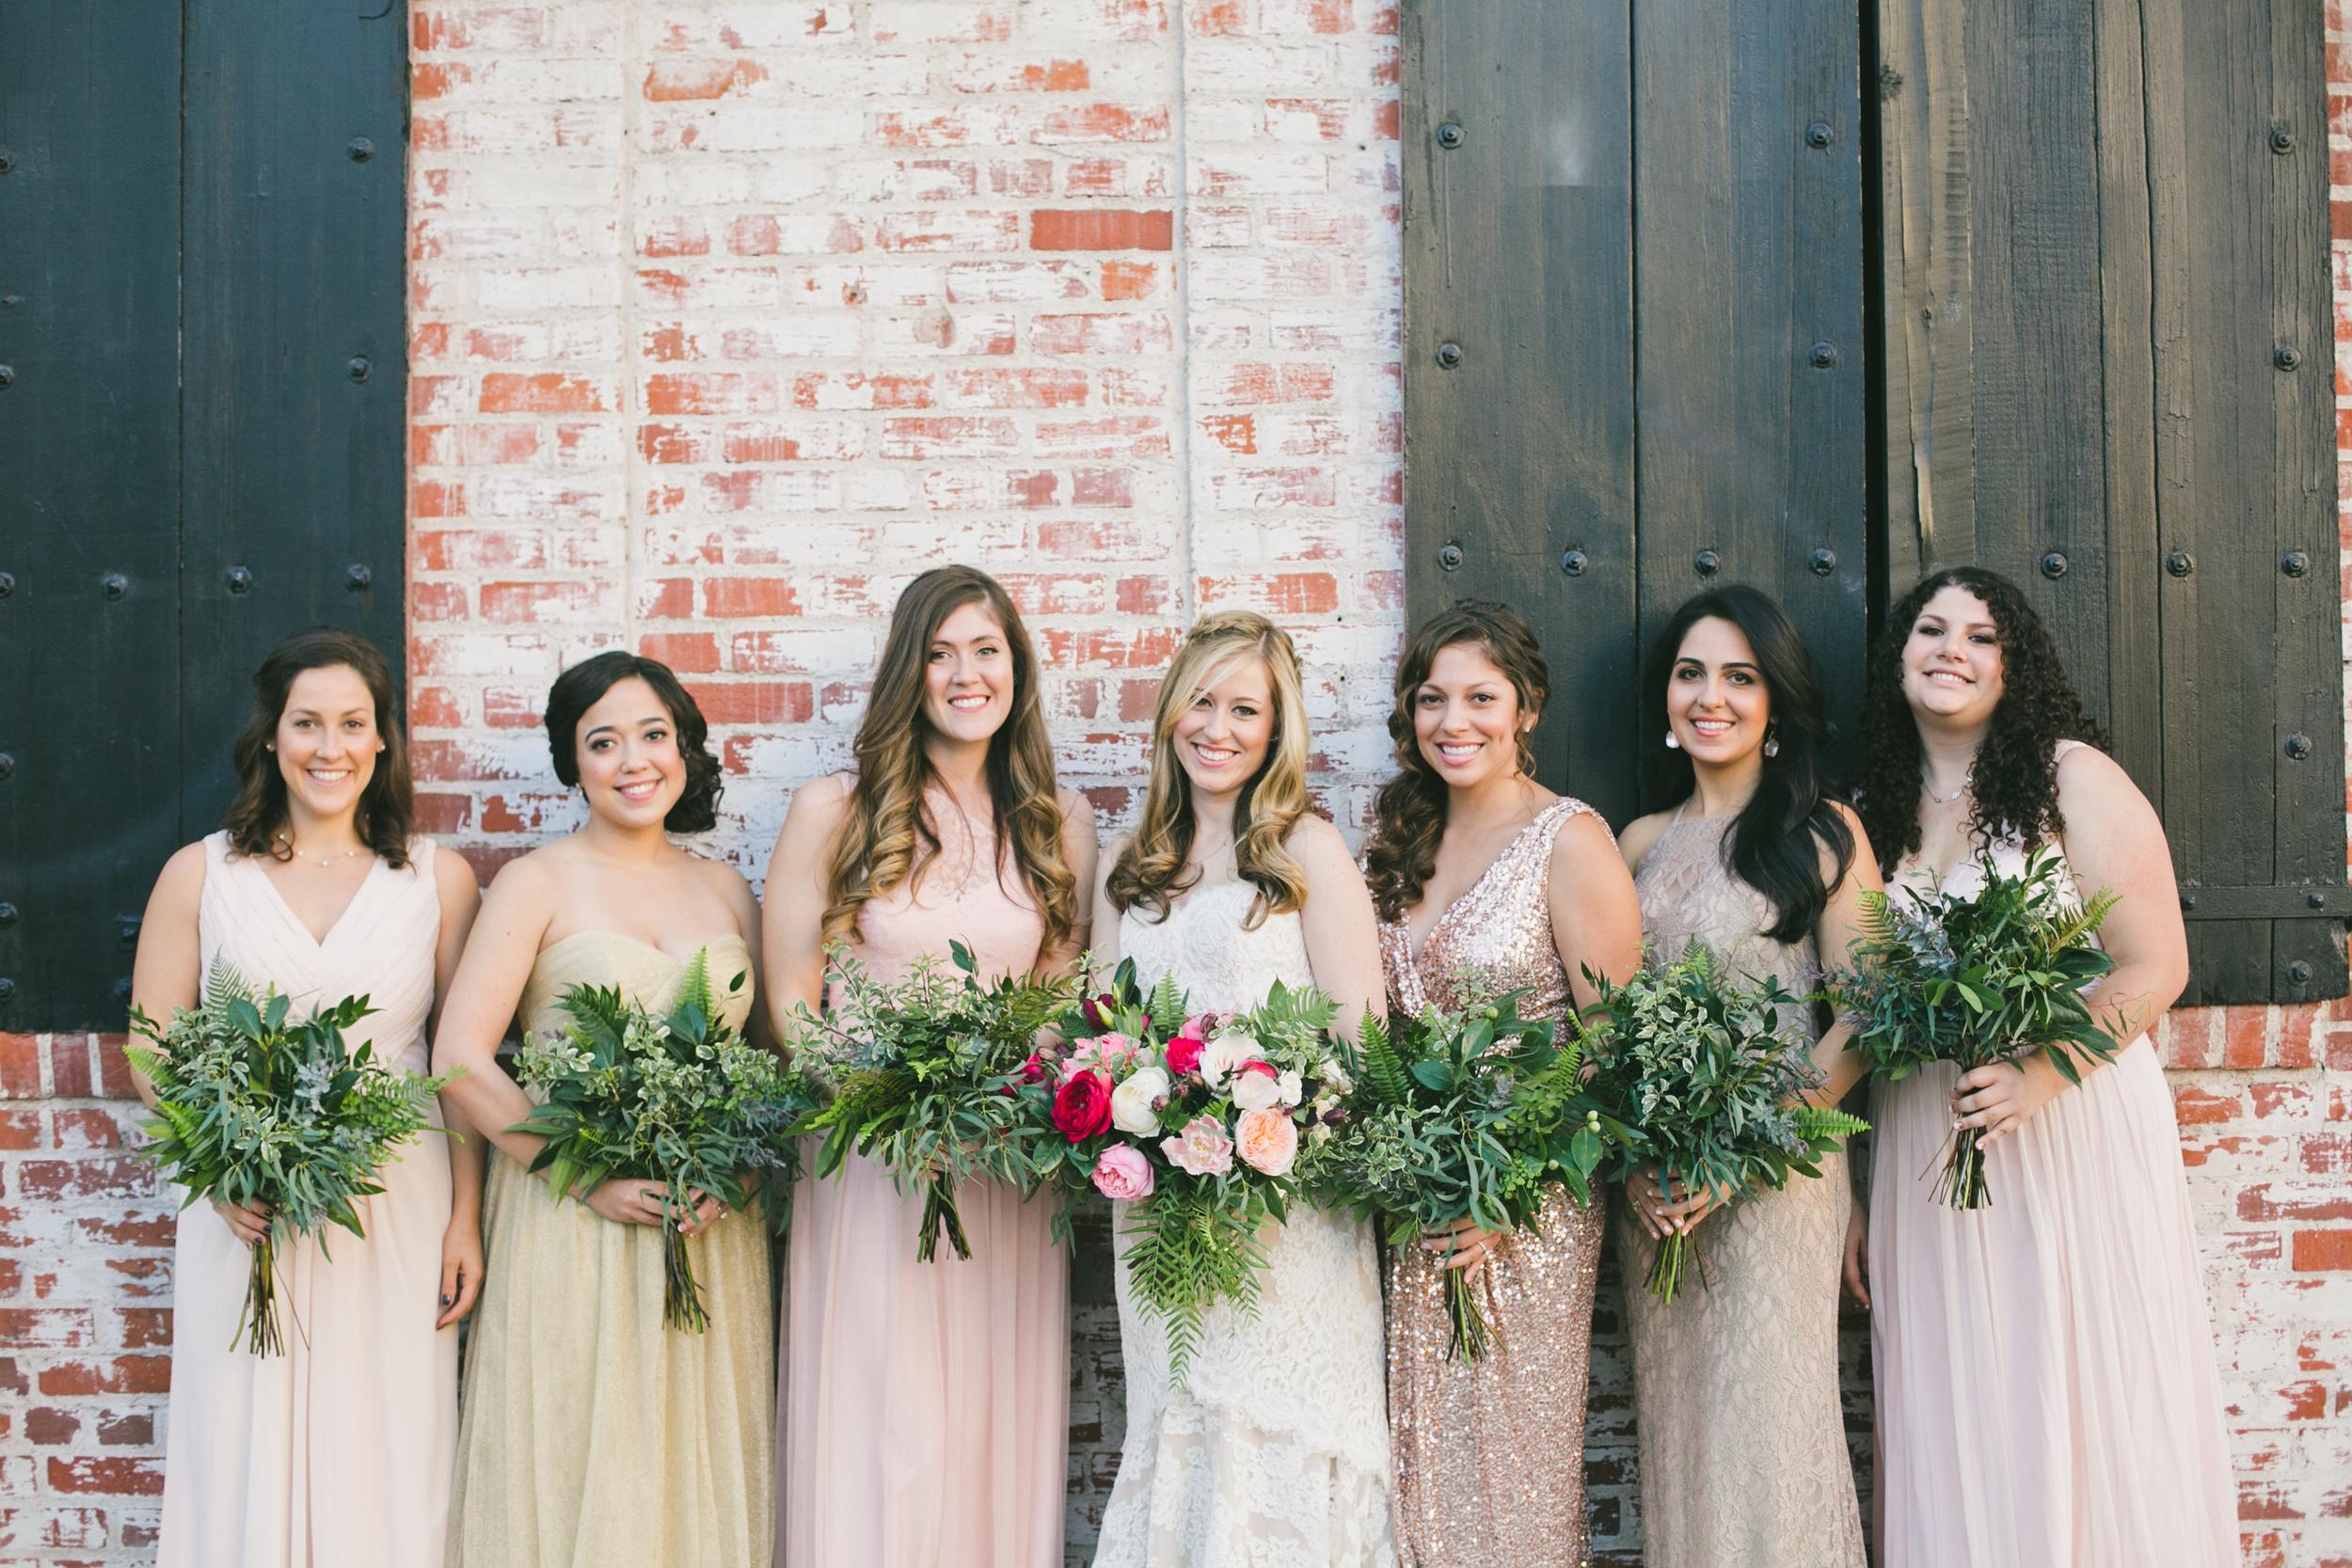 024 bridesmaids.JPG